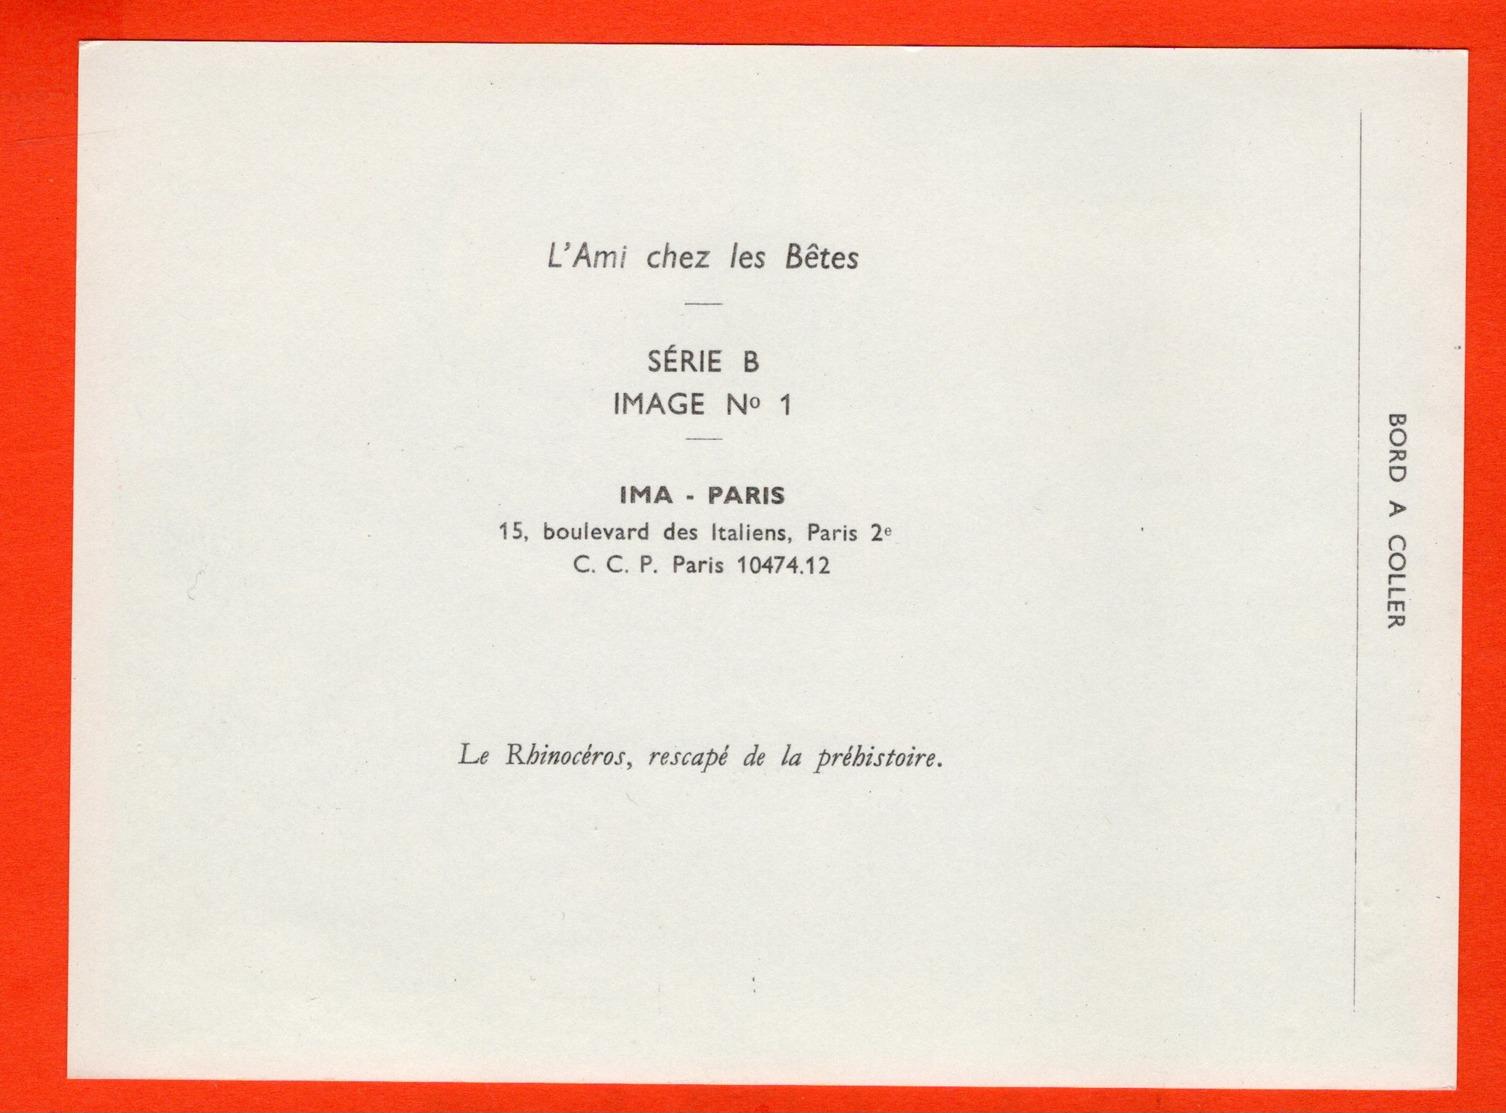 GRANDE IMAGE POUR ALBUM (12 X 16 Cm)  - L'AMI CHEZ LES BÊTES - IMA - LE RHINOCÉROS - Documentos Antiguos